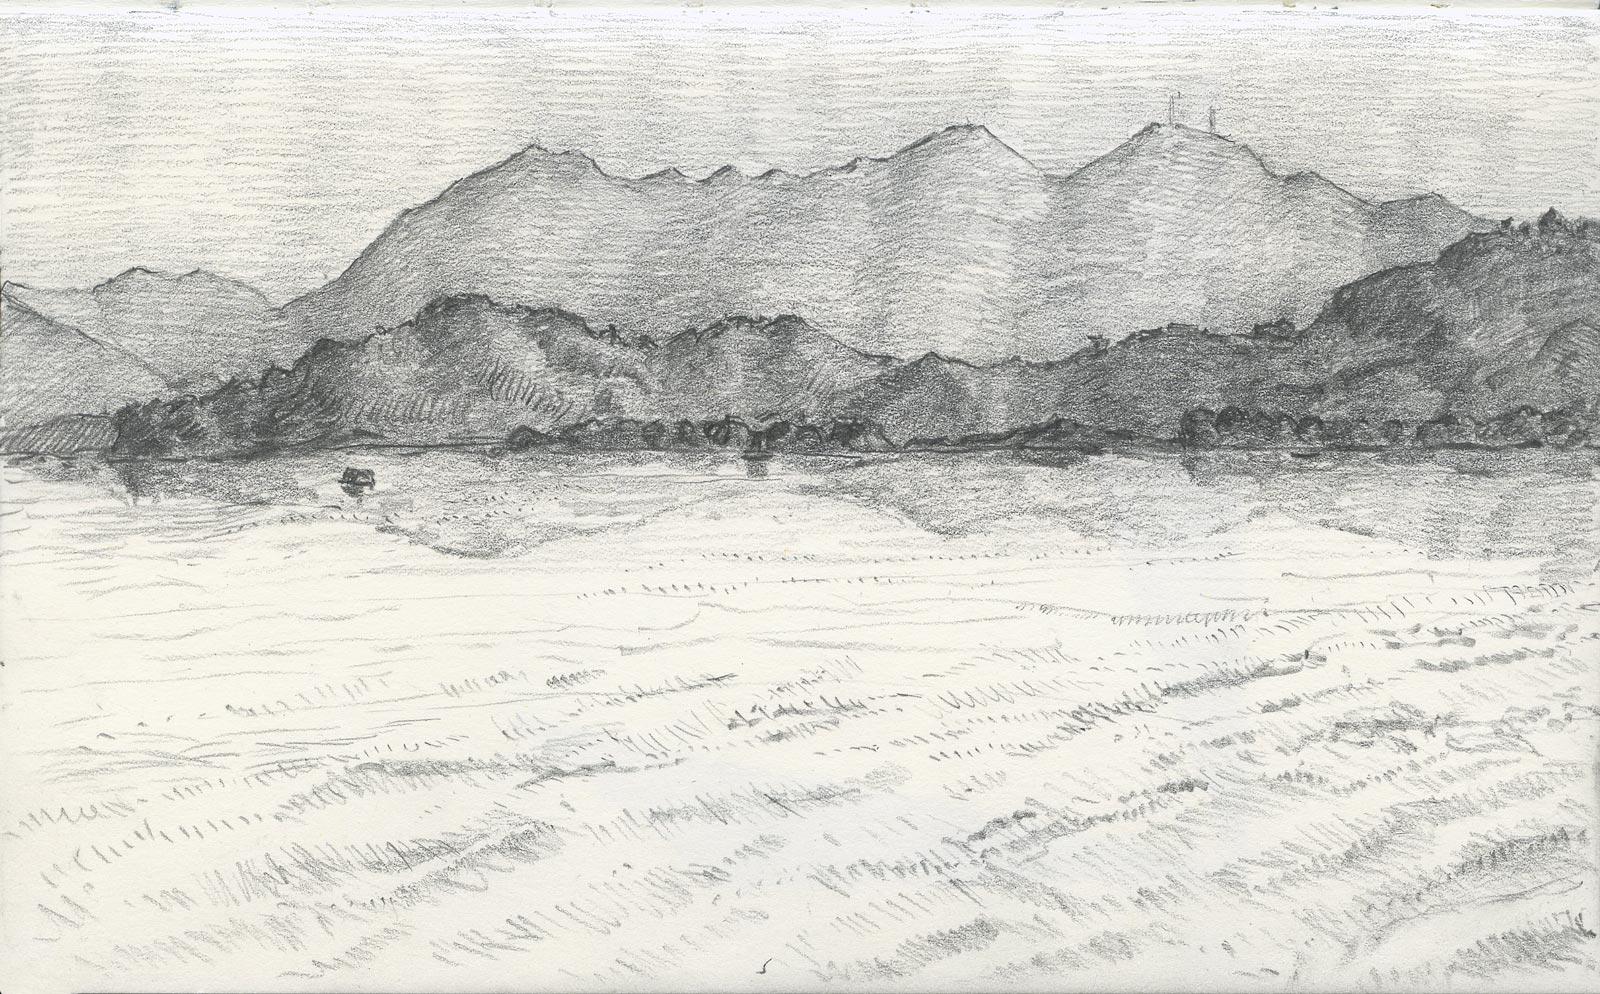 View of West Lake, Hangzhou, China